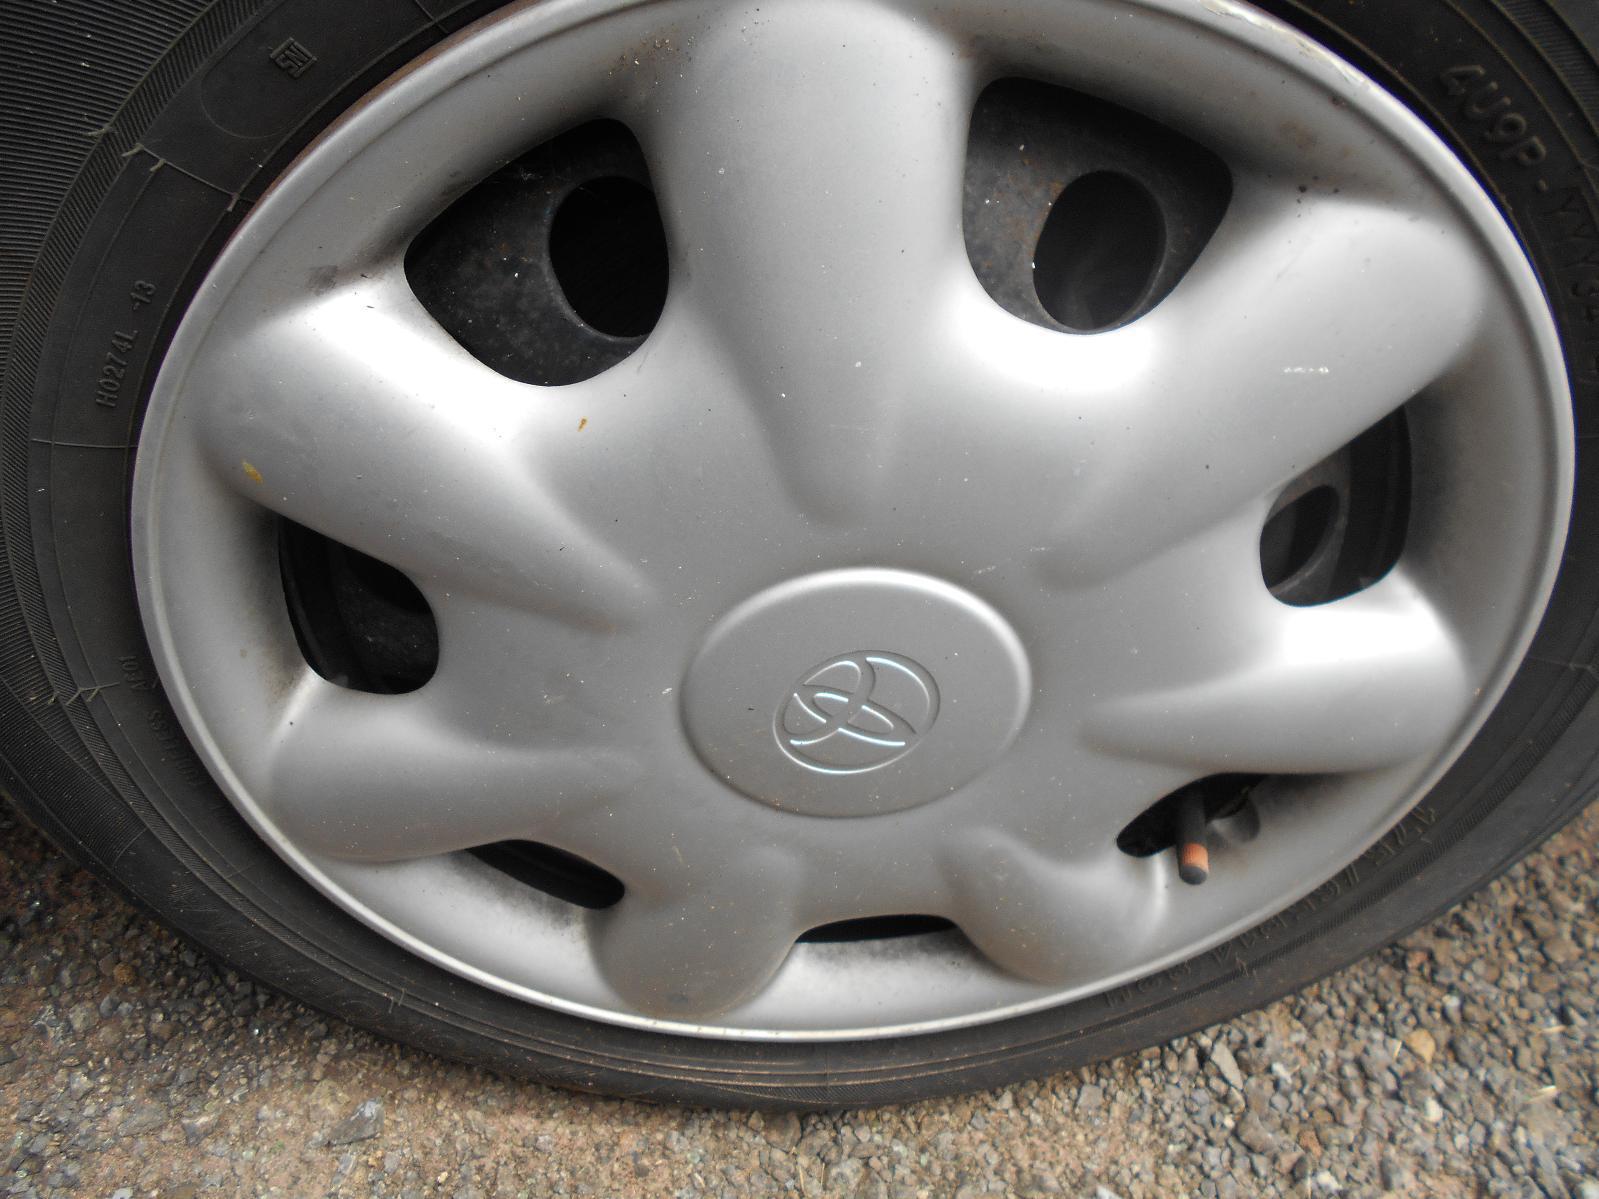 TOYOTA COROLLA, Wheel Cover/Hub Cap, AE112 10/98-11/01